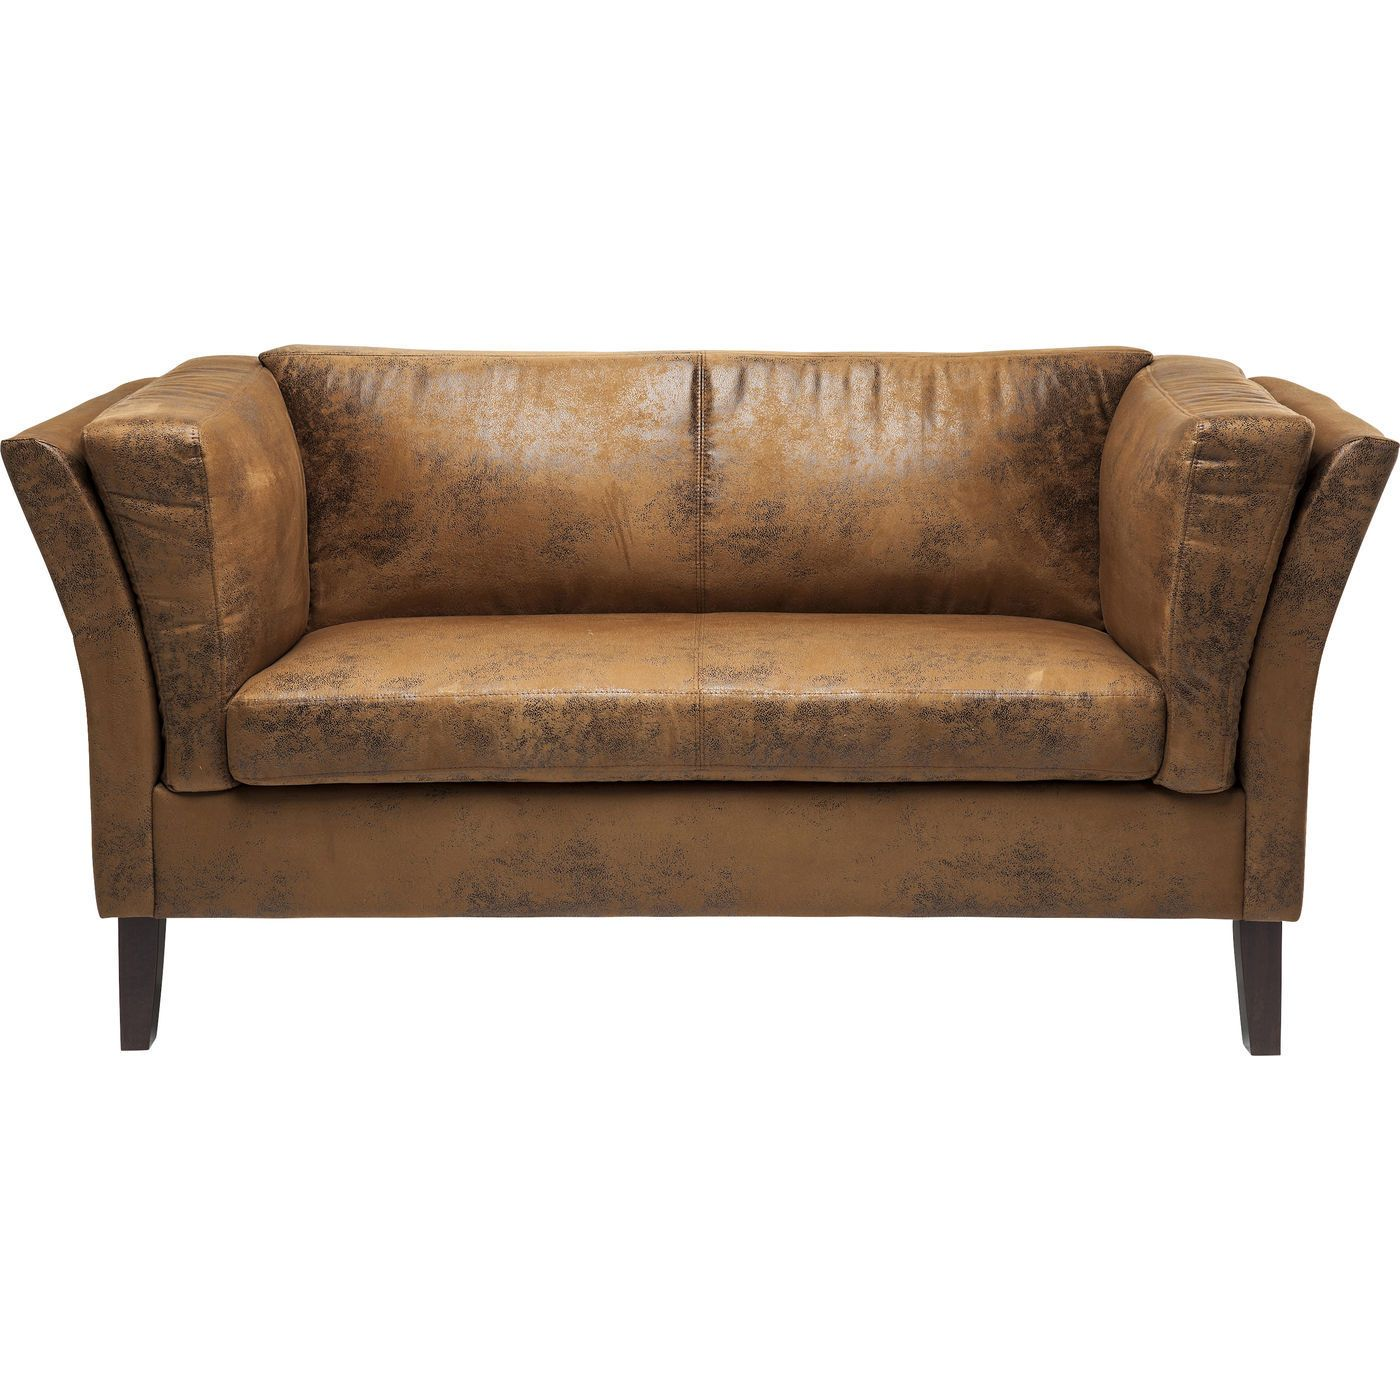 Sofa Canapee Vintage Eco 2zits Kare Design Banken